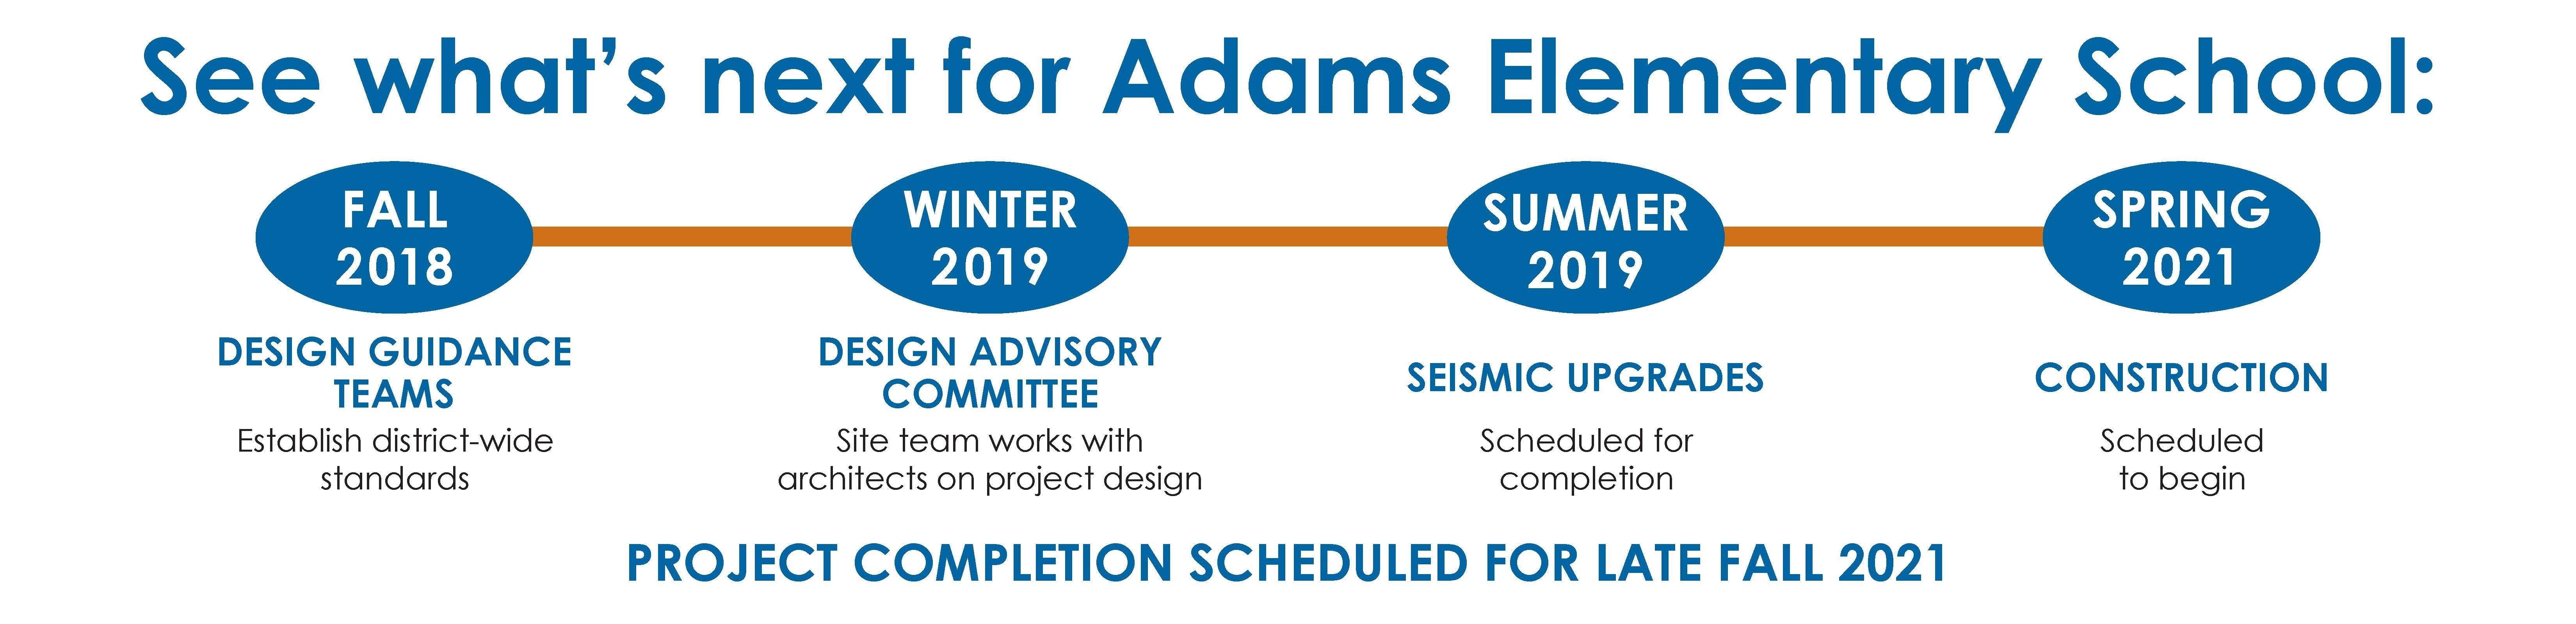 Adams Elementary - Corvallis School District 509J Calendar 2019